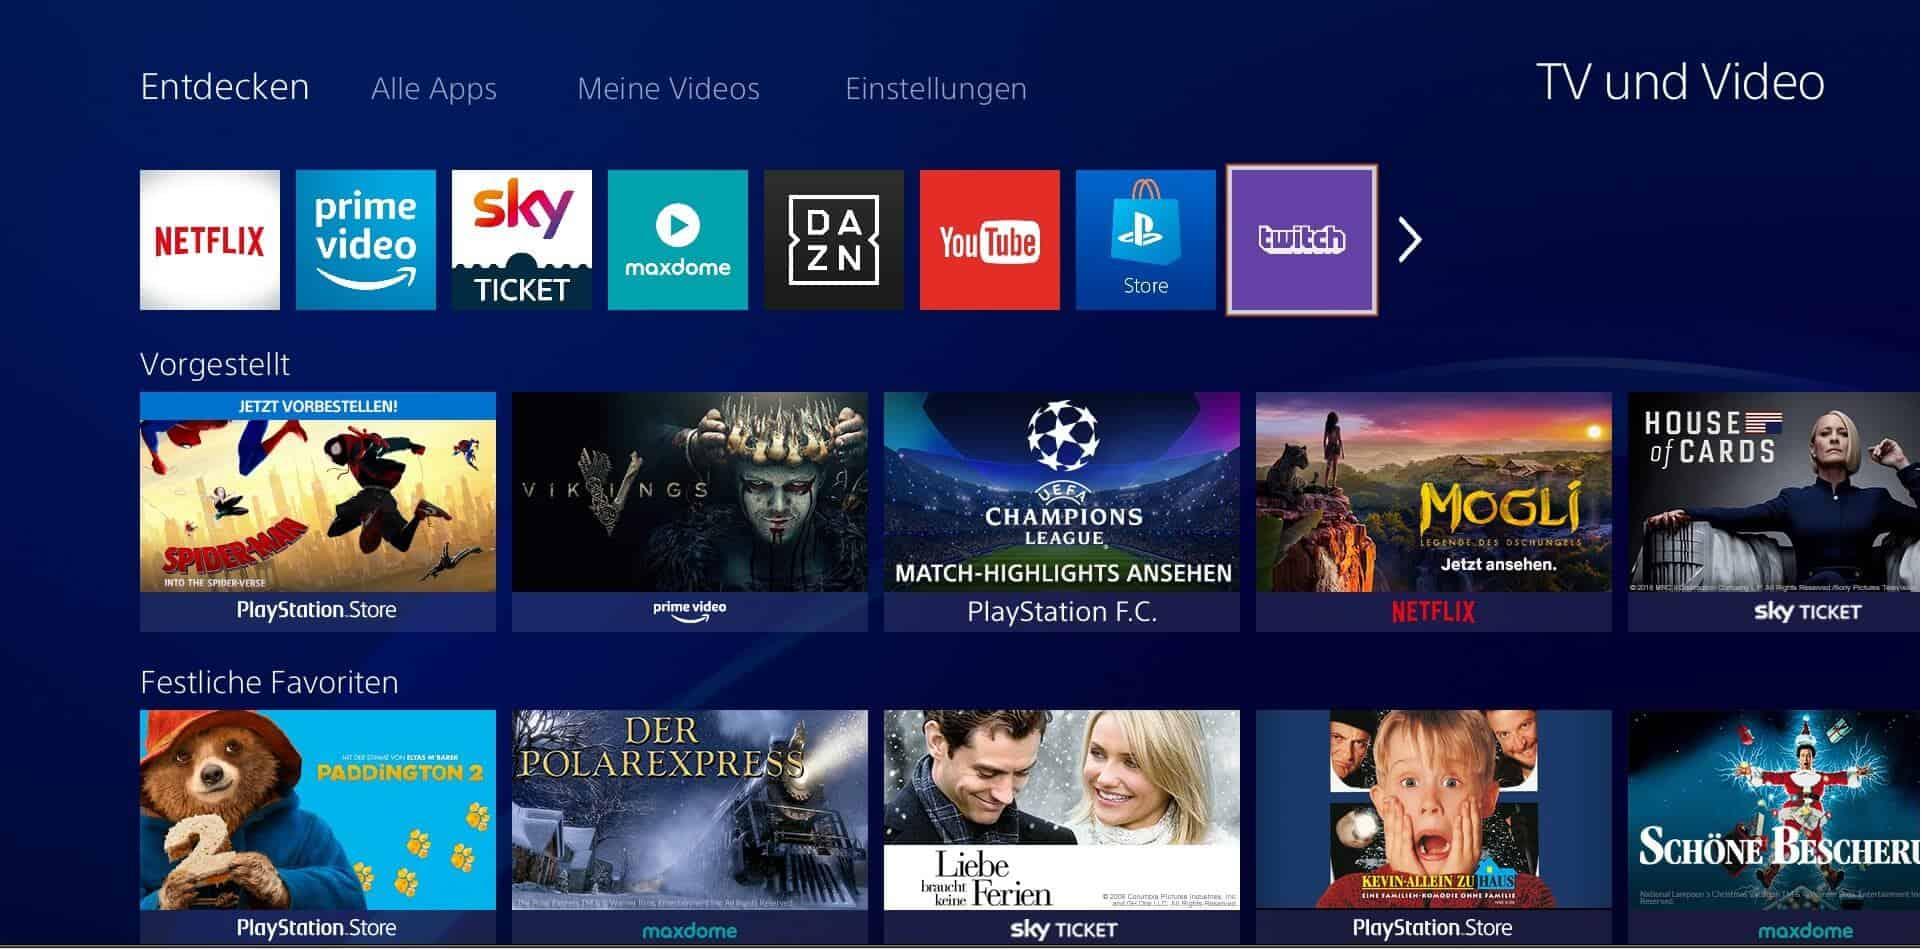 Twitch-app-über-playstation-4